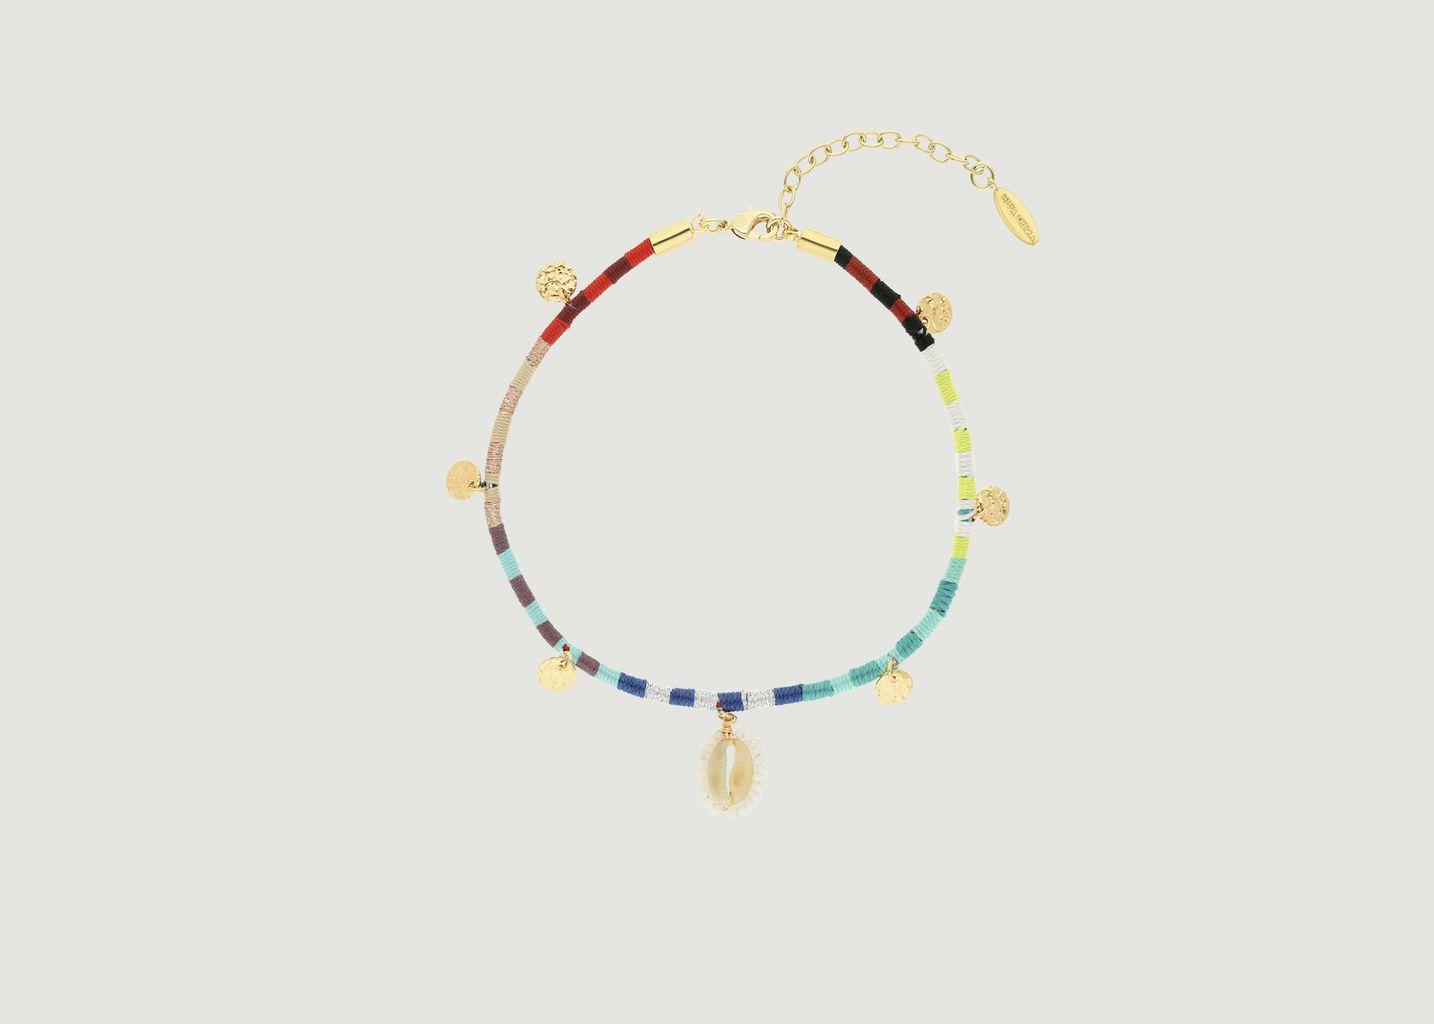 Bracelet de cheville Nayade - Hipanema